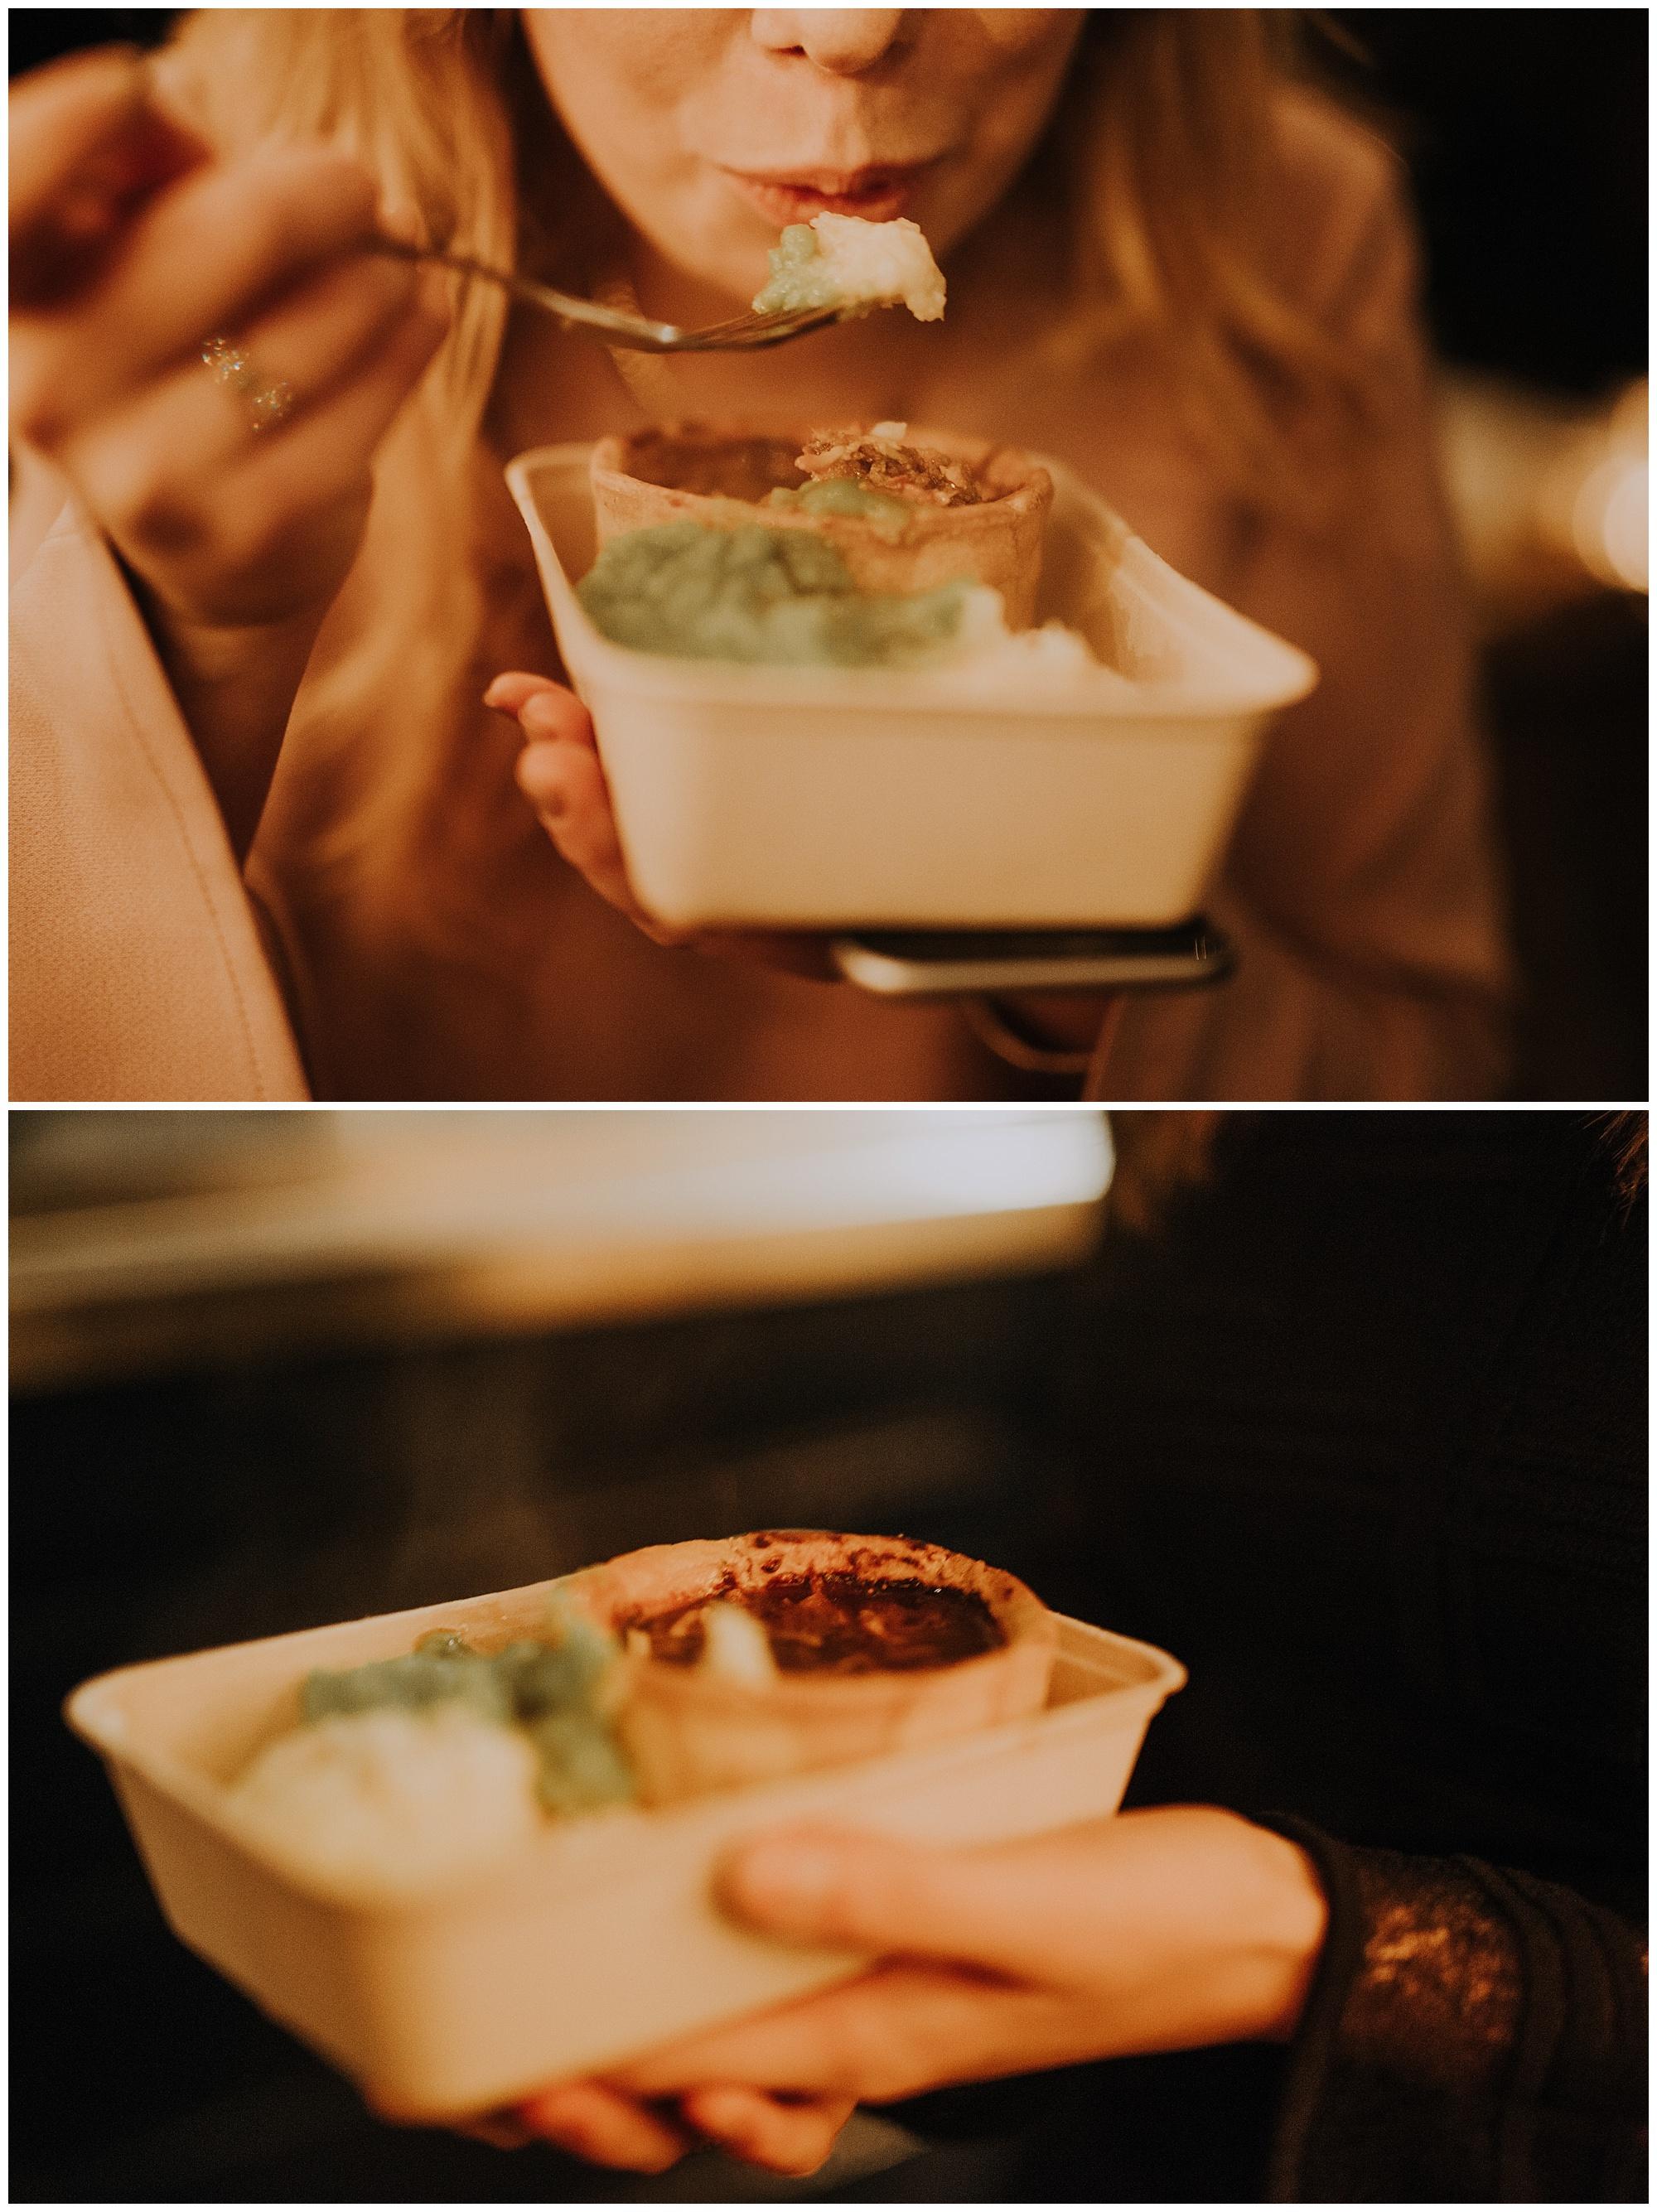 close ups of pie dish